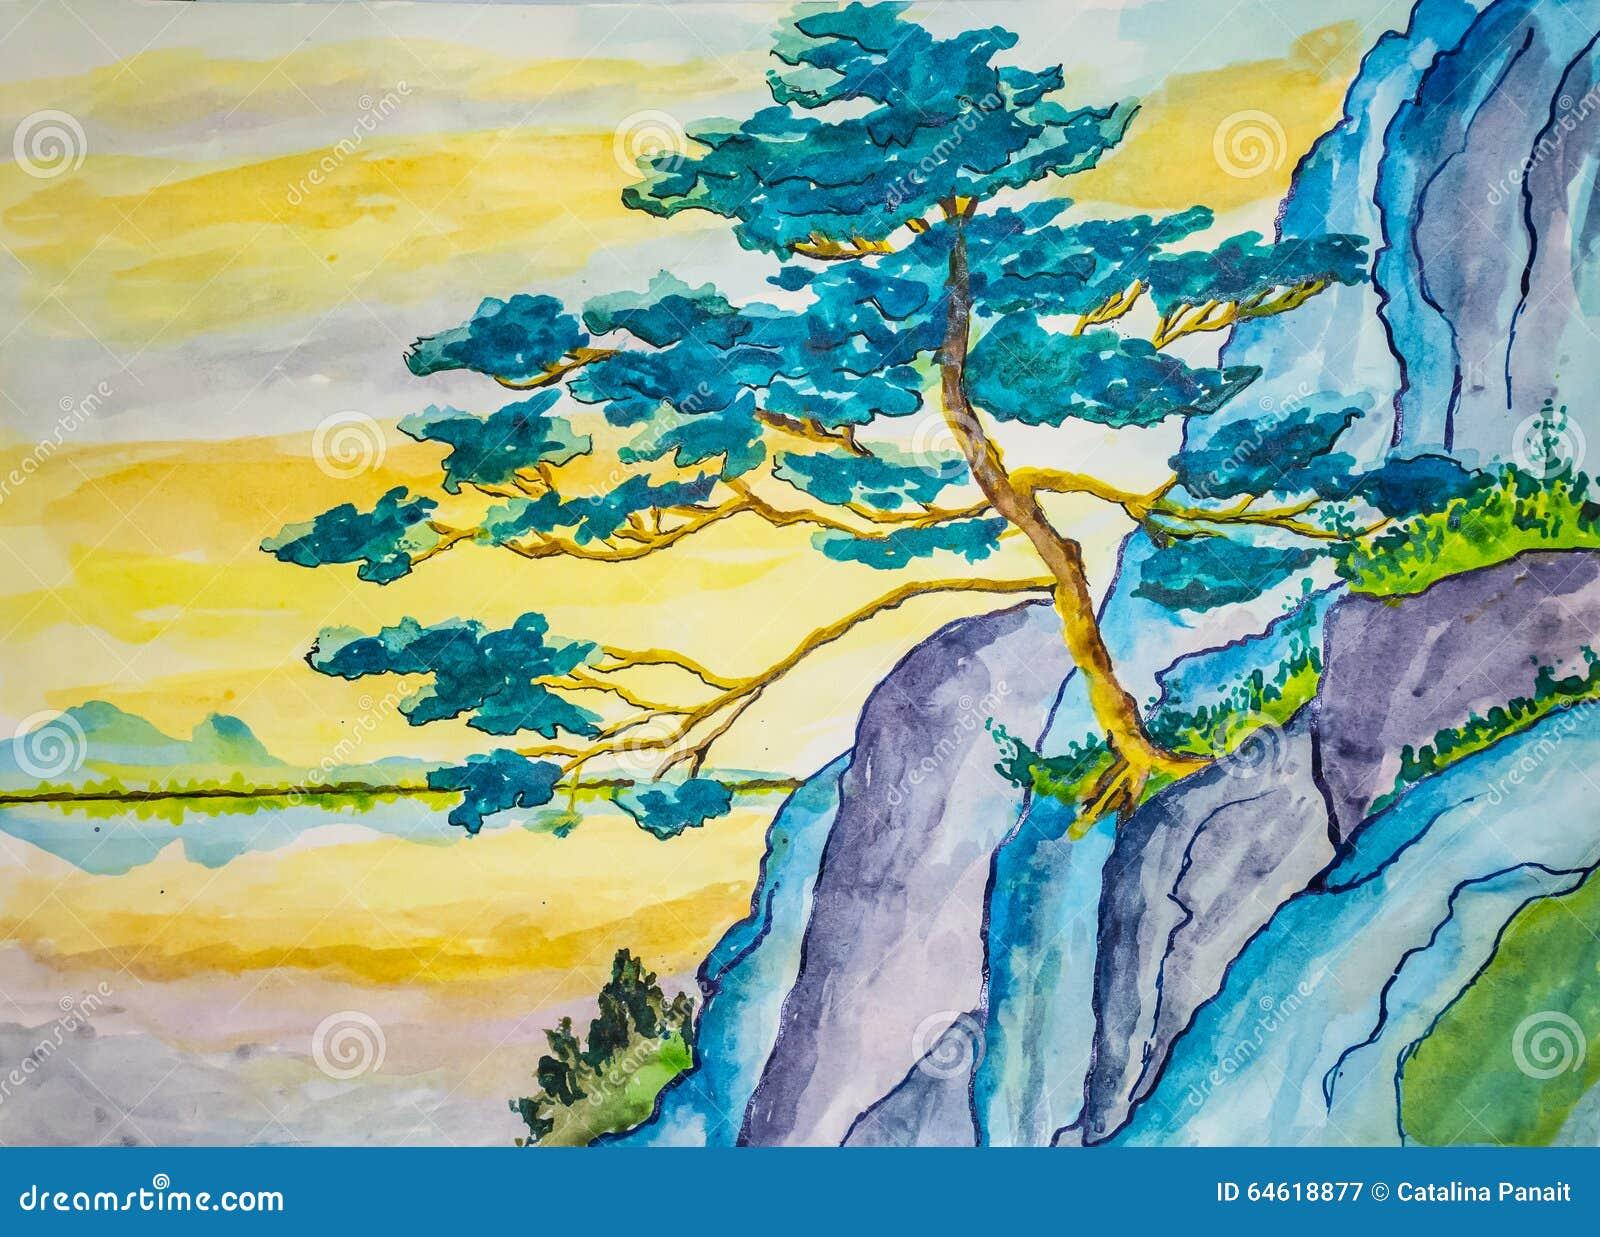 Horizontal Oil Painting